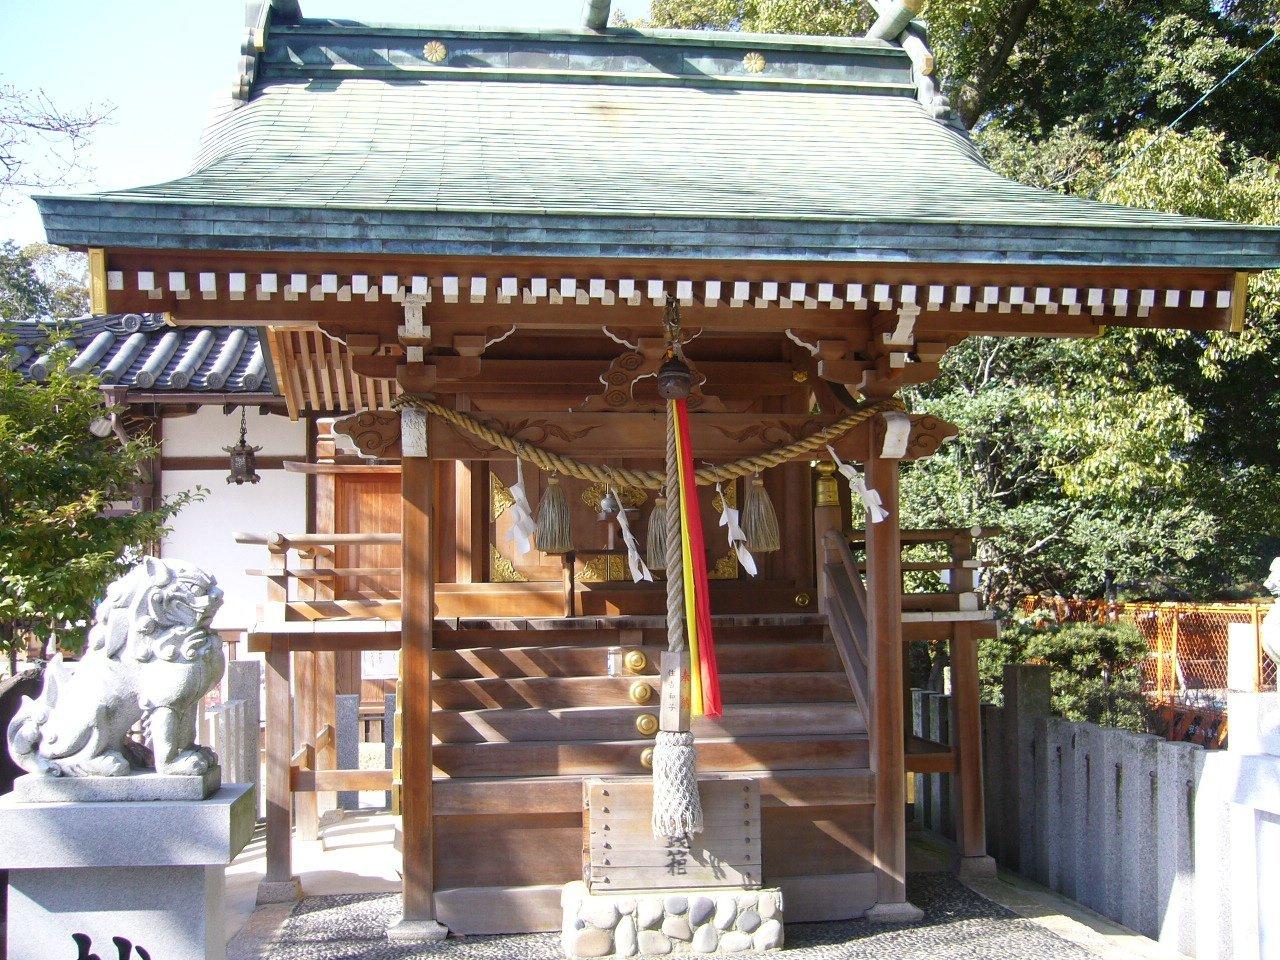 枚方市の神社 百濟王神社_c0112559_08294965.jpg